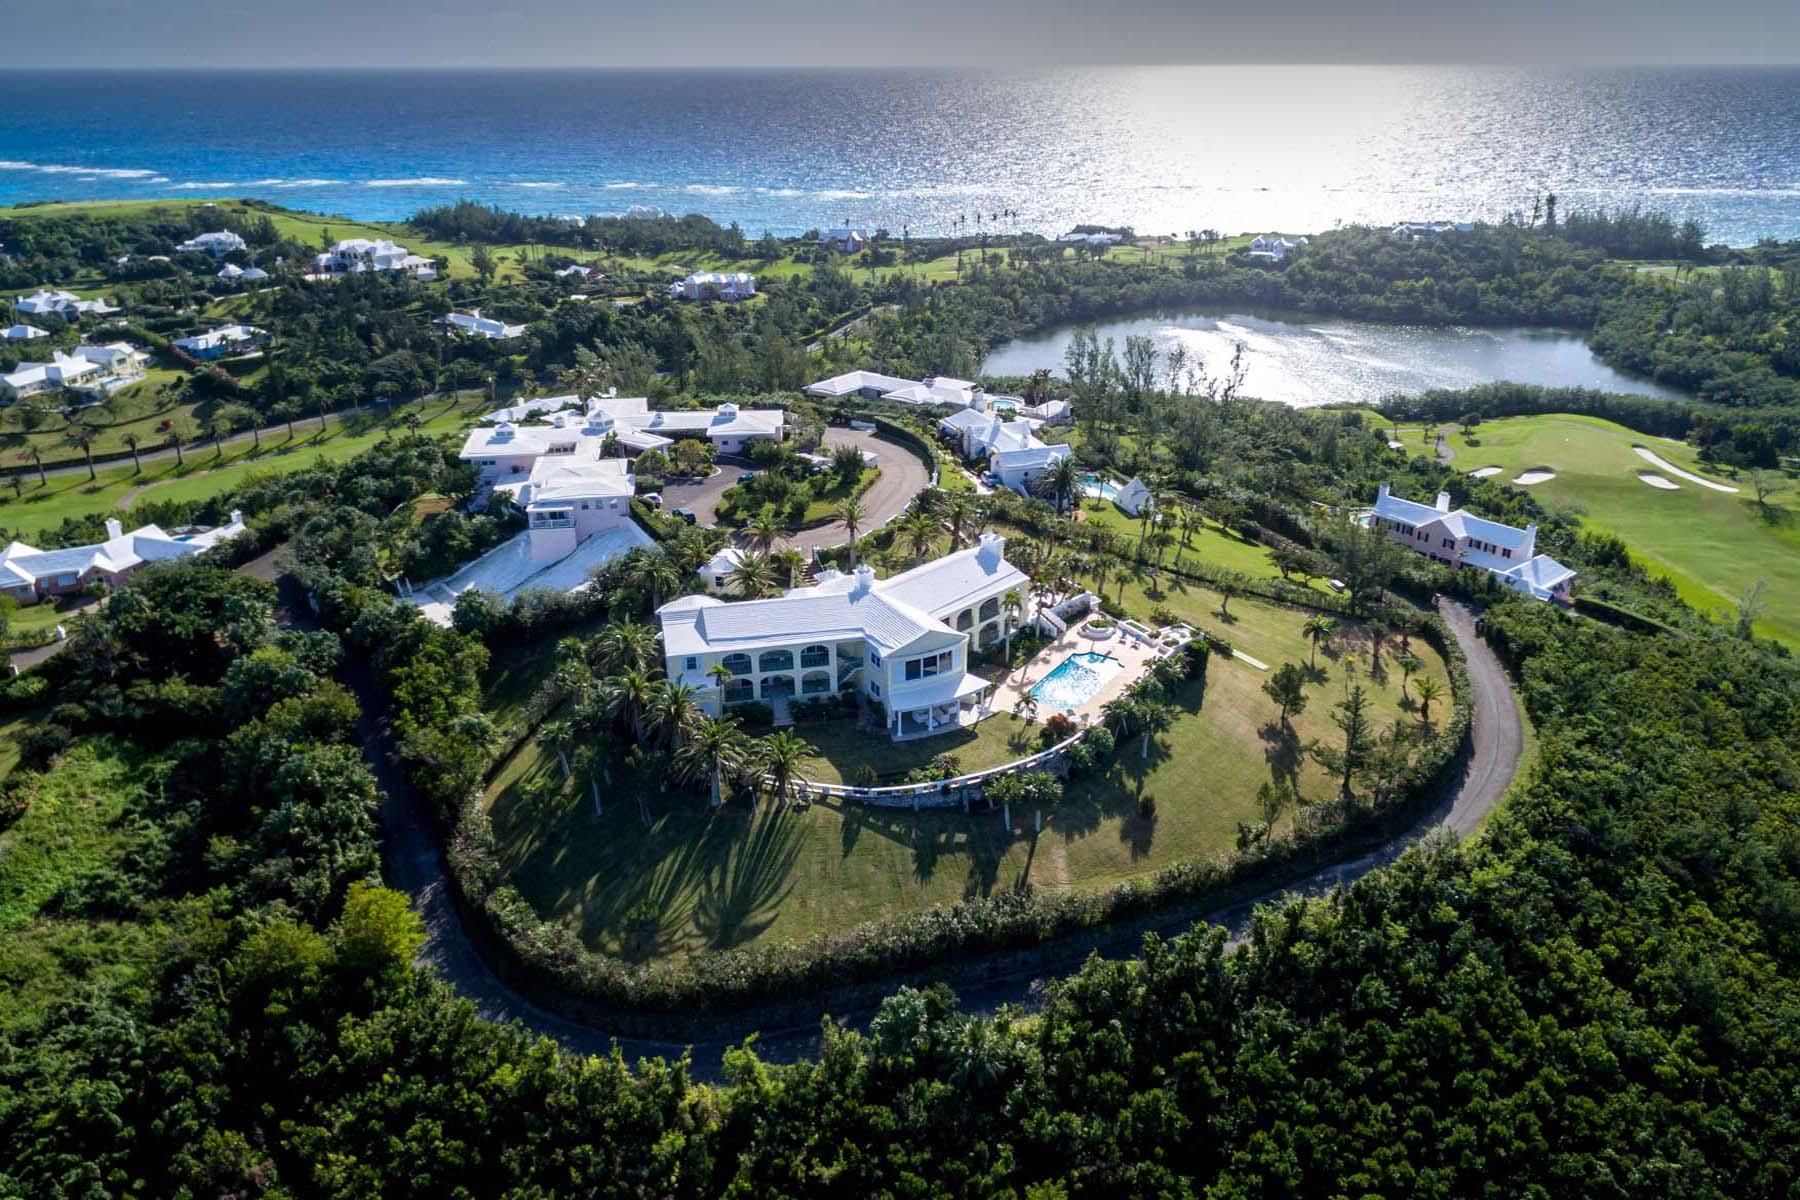 Single Family Home for Sale at Forty Palms 15 Glebe Hil Hamilton Parish, HS02 Bermuda